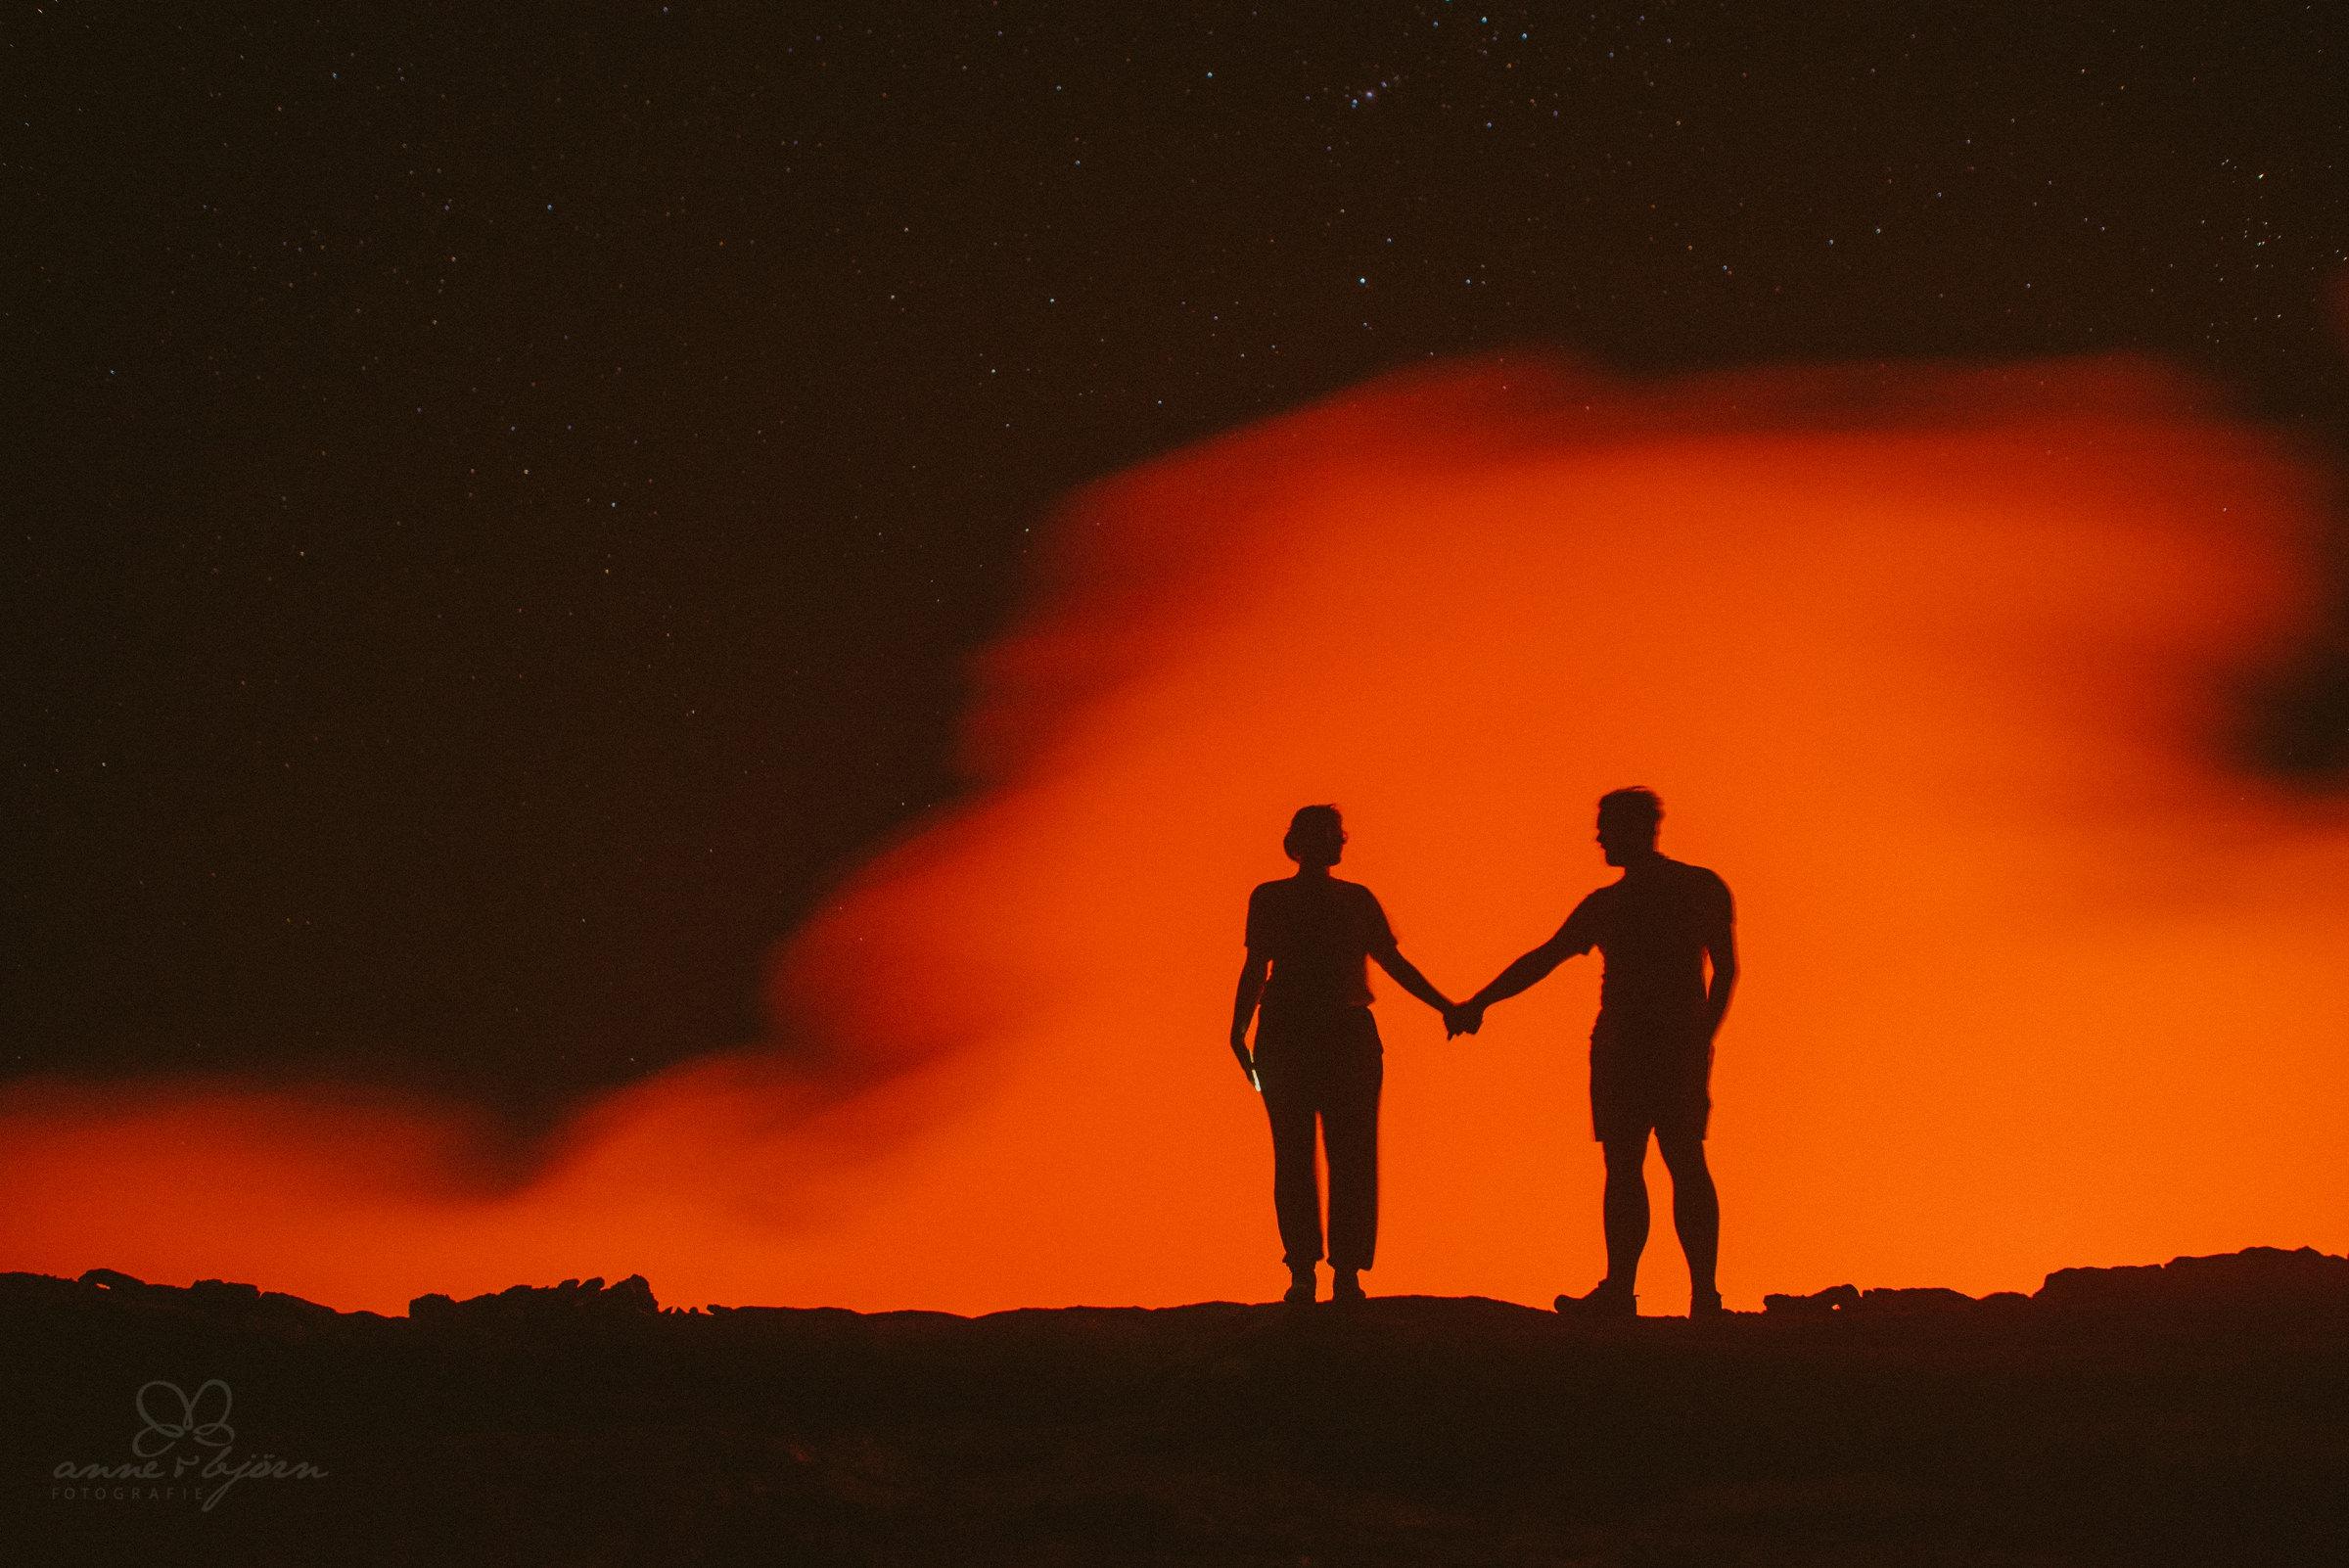 Portrait, Kunst, Reisefotograf, Hochzeitsfotograf, Lava, Danakil Depression, Wanderung, Hike, Abenteuer, Reise, Lavasee, Erta Ale, Eritrea, Ethiopia